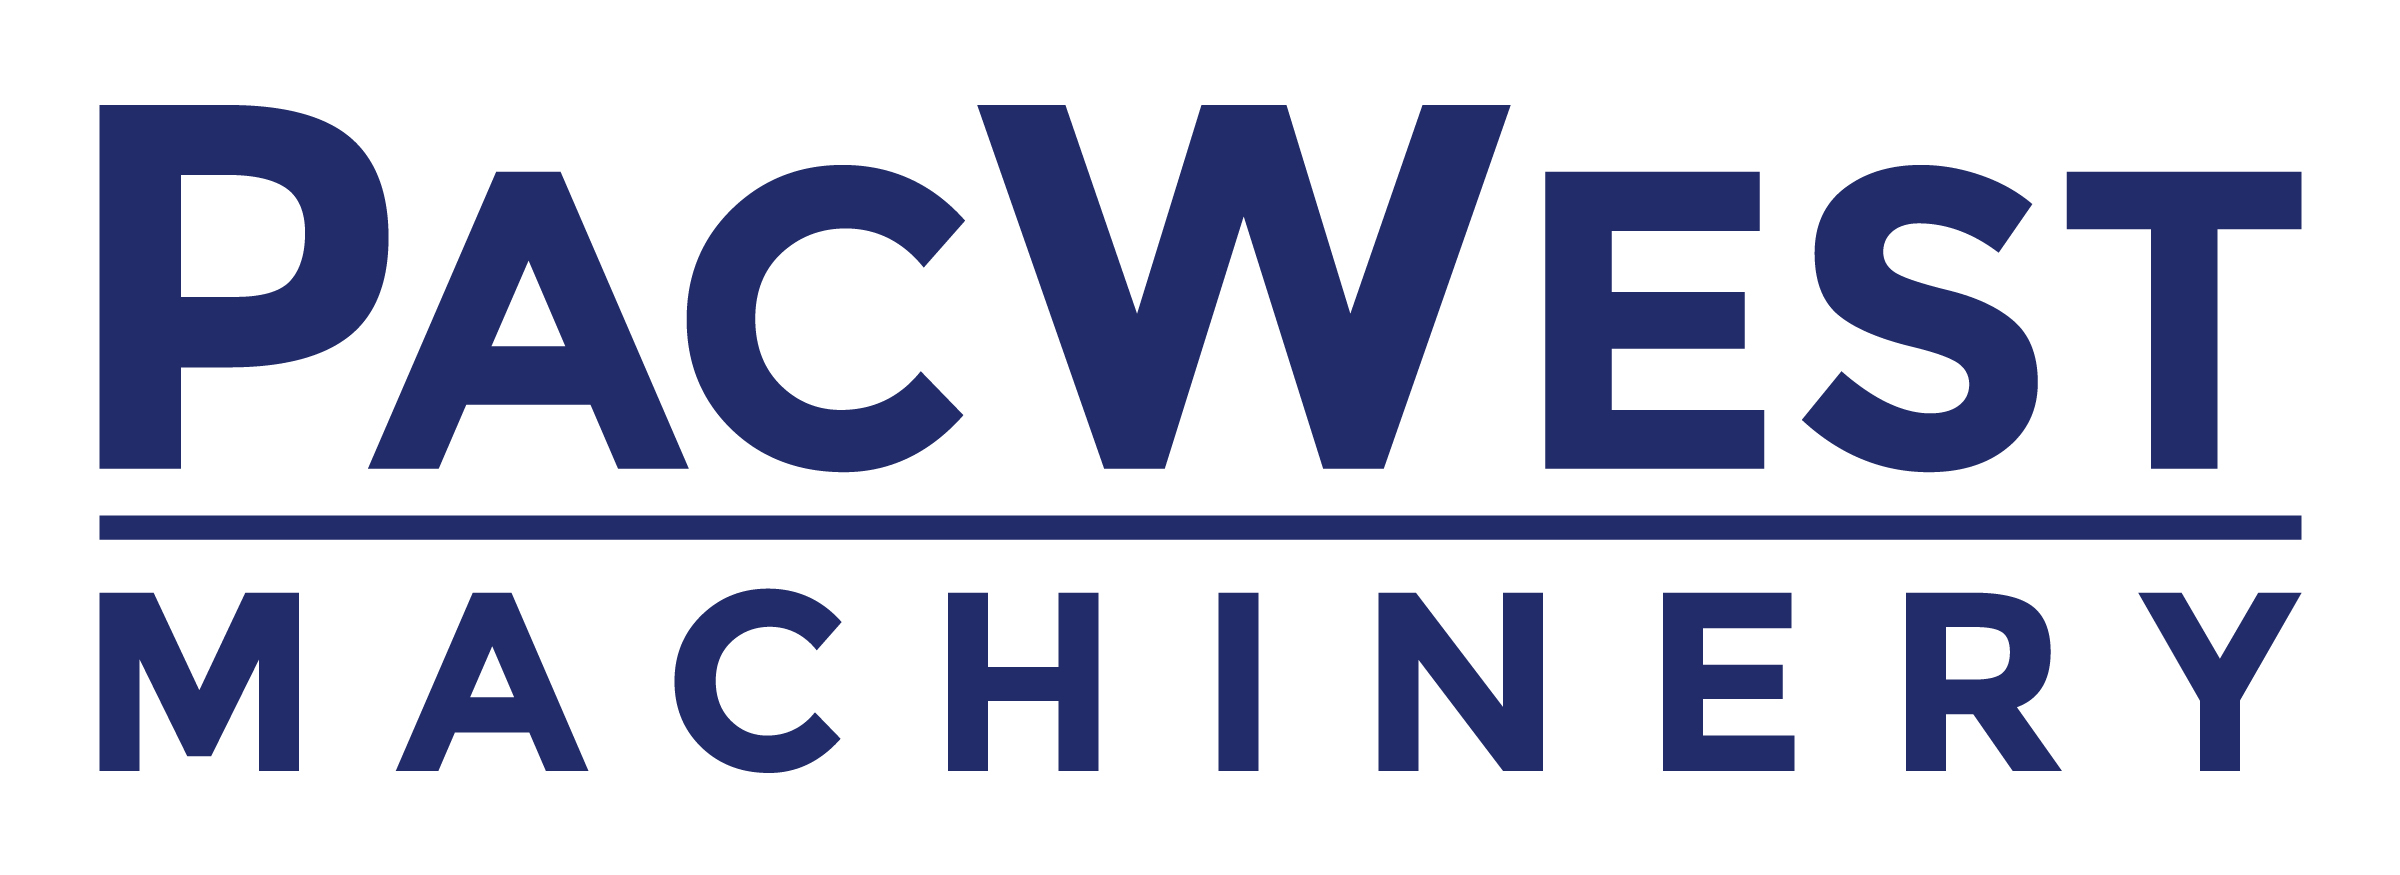 PacWest Machinery company logo